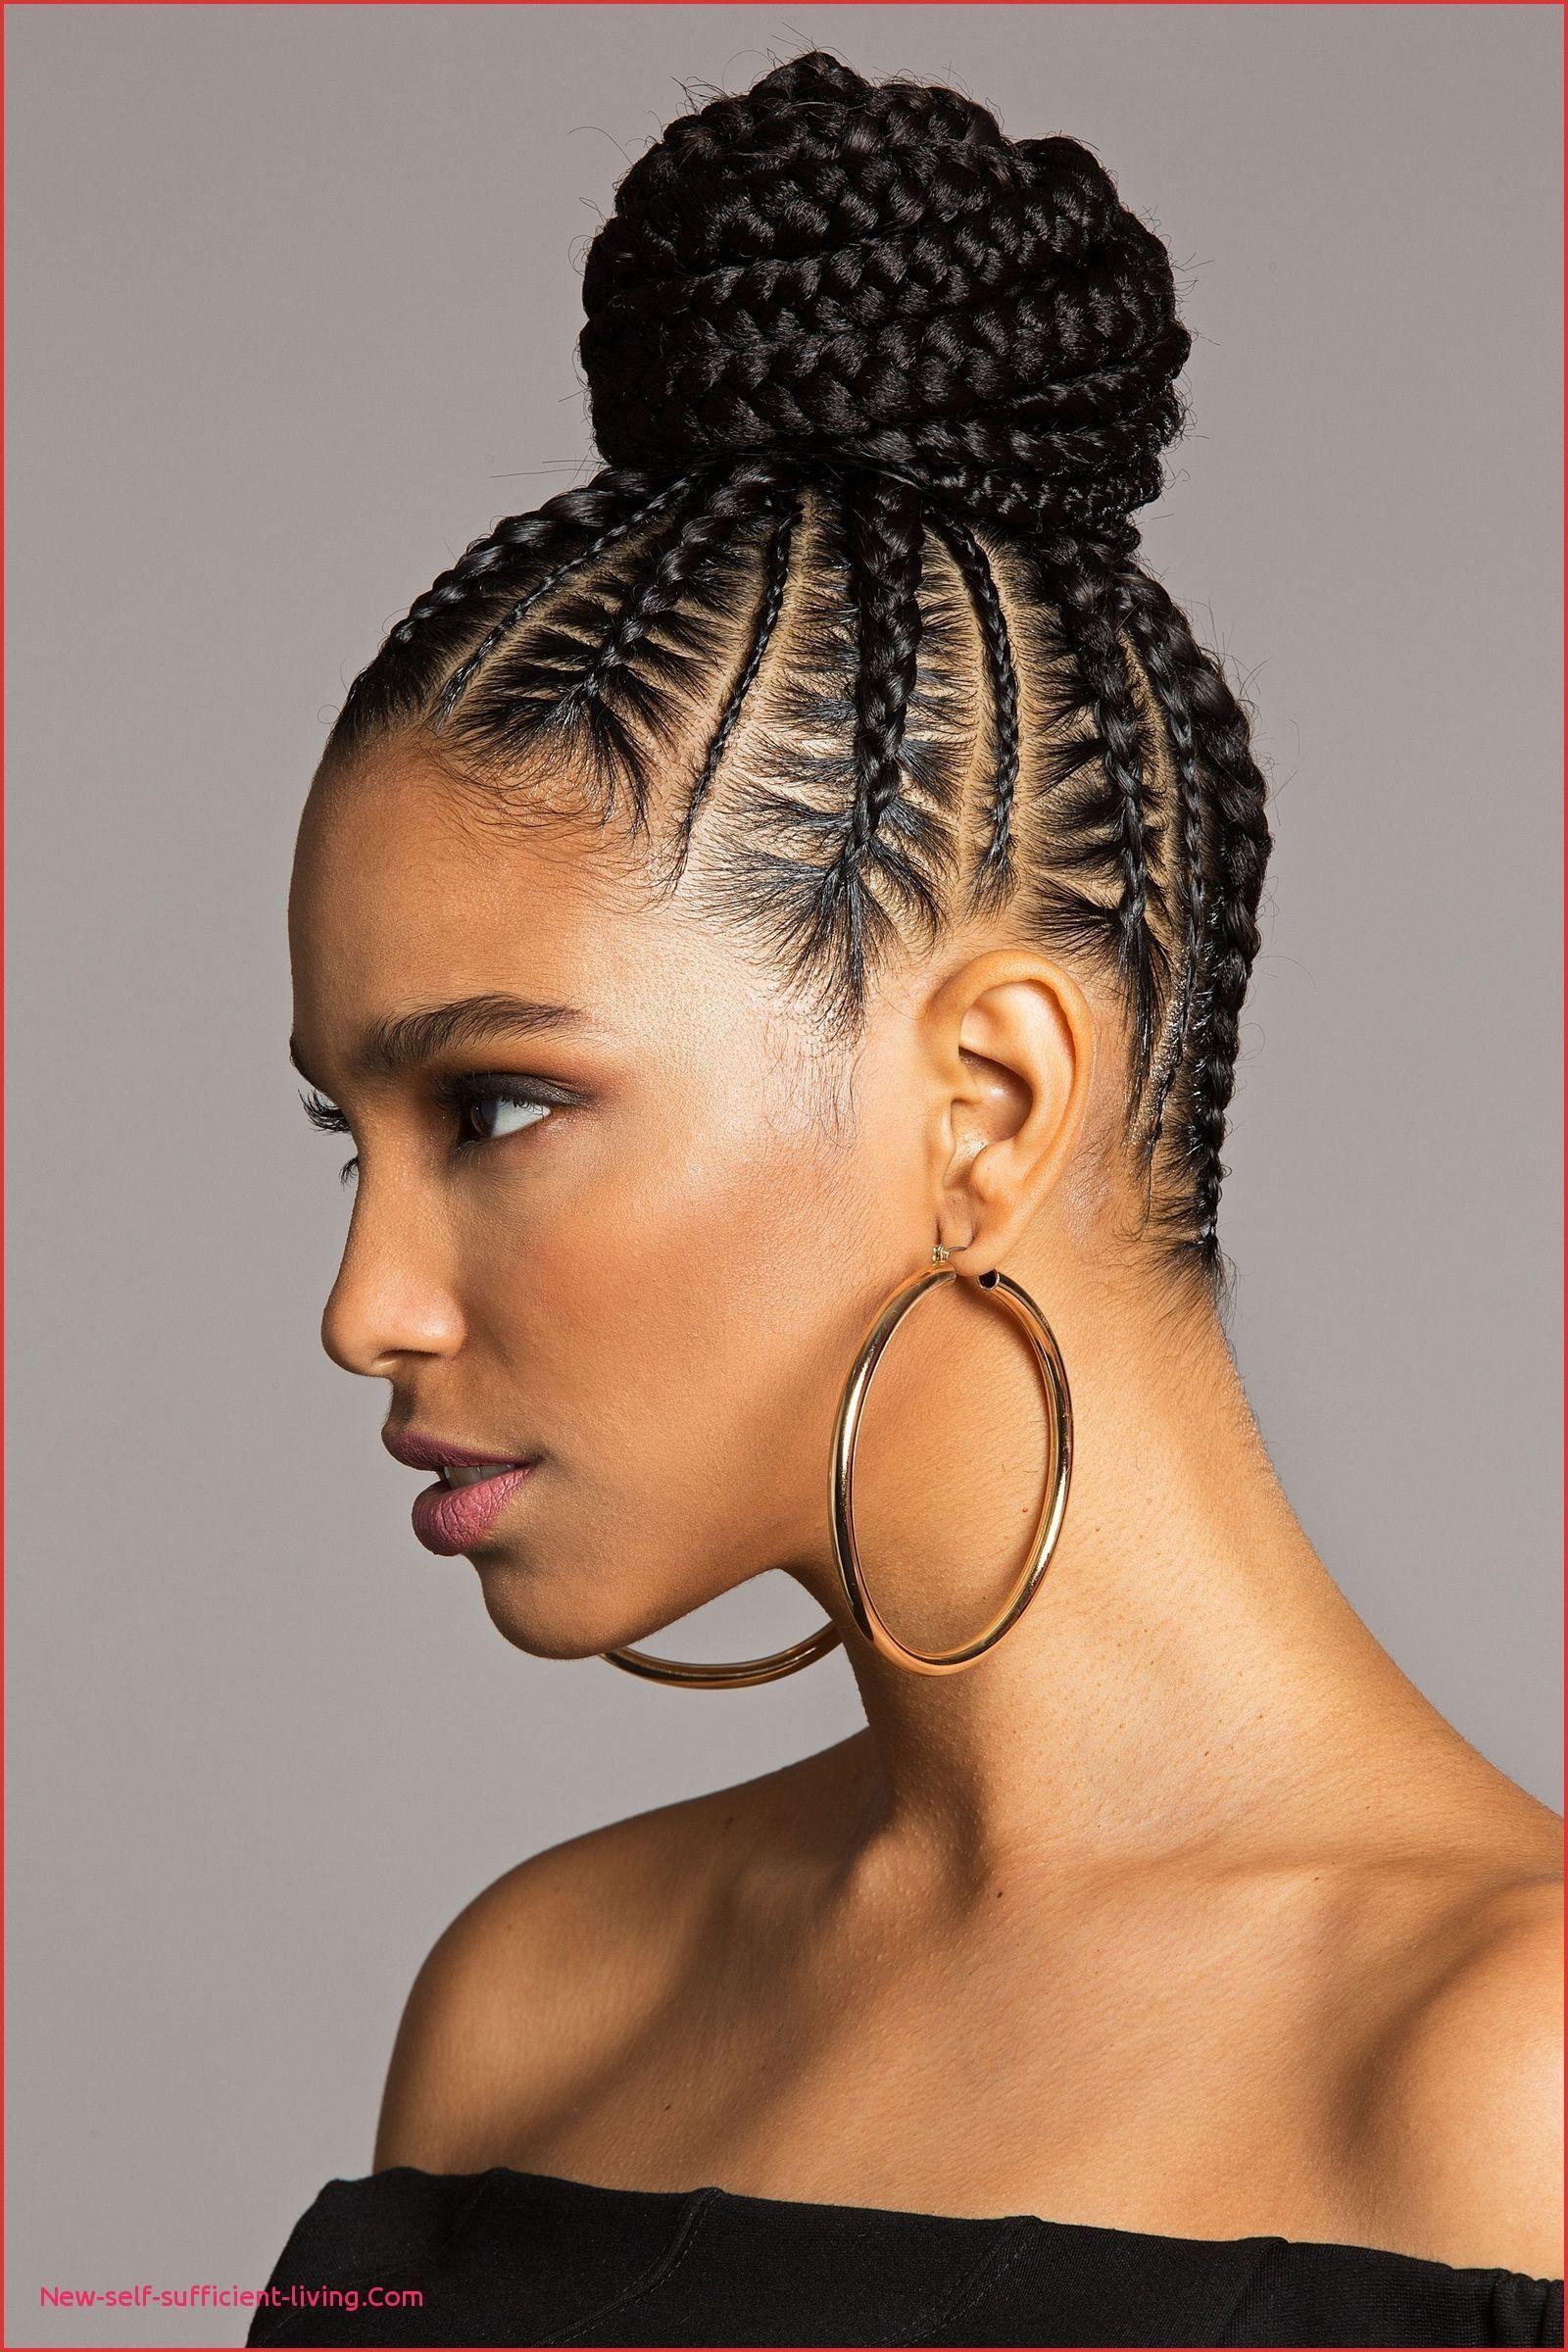 Halo Braid Short Natural Hair 26371 Elegant African American Braided Bun Hairstyles New Self 2637 Cornrow Braid Styles Braided Hairstyles Updo Hair Styles